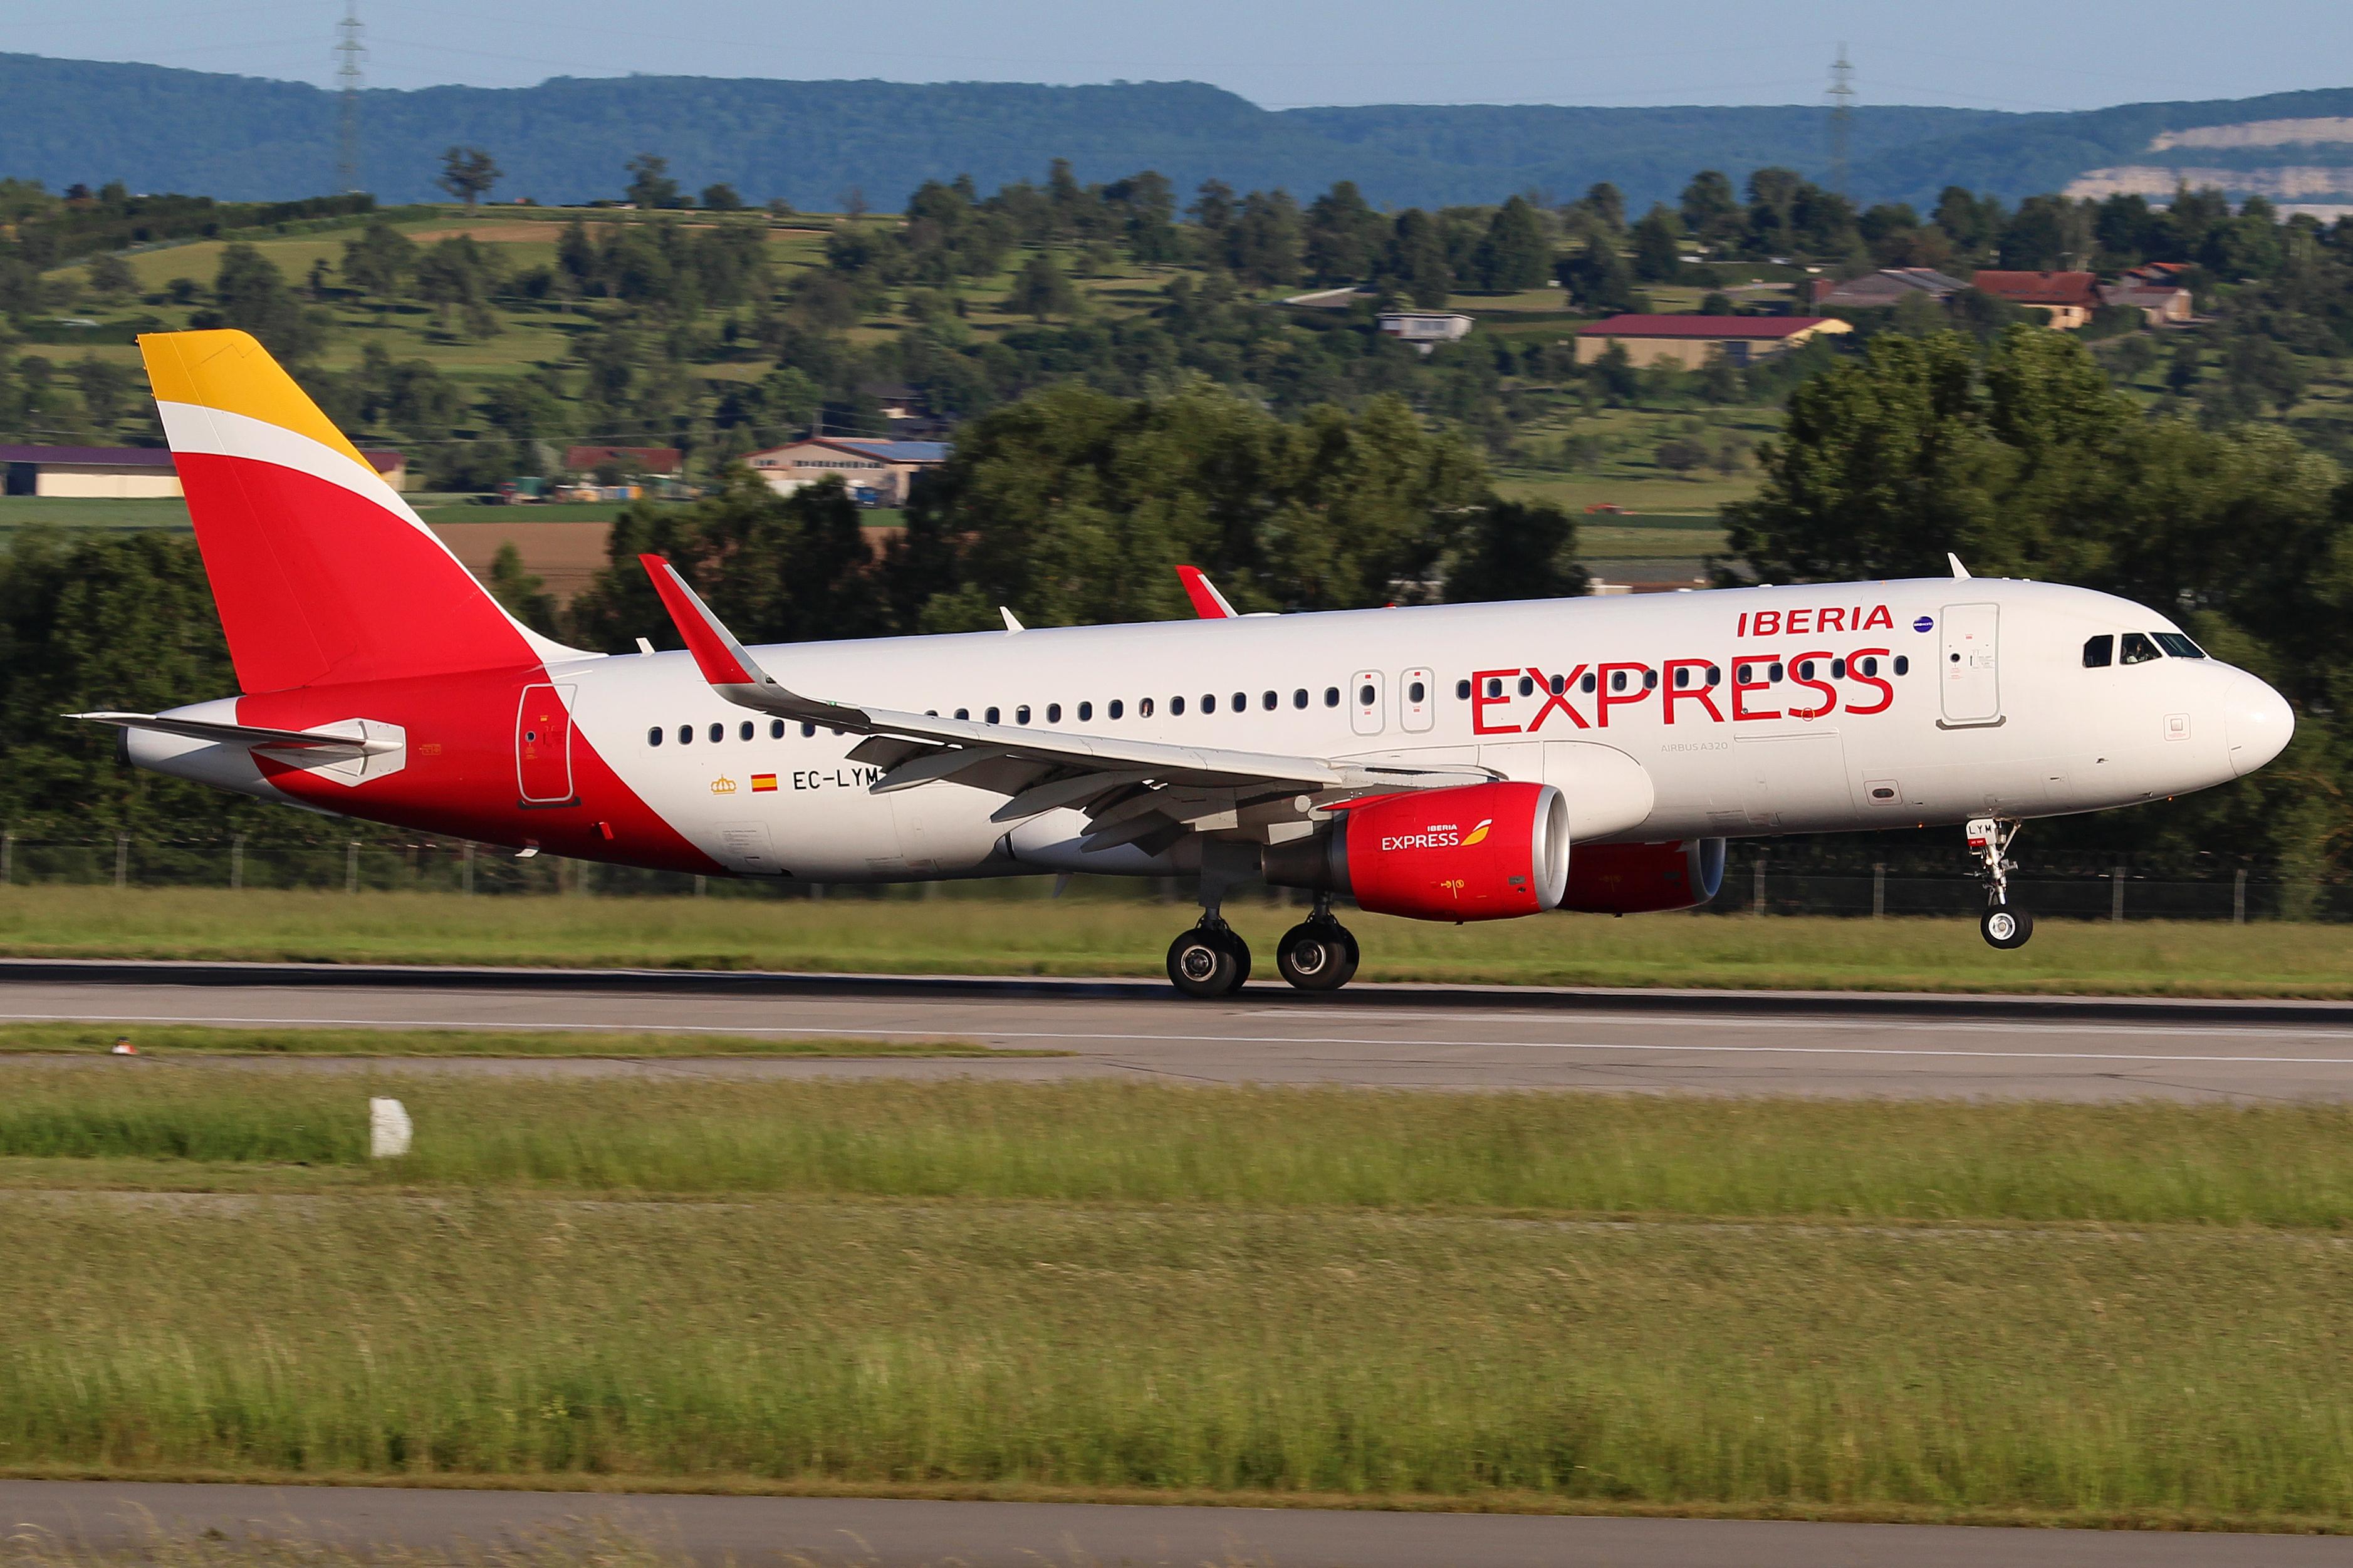 La Guardia Civil denuncia a Iberia por el vuelo del domingo a Gran Canaria